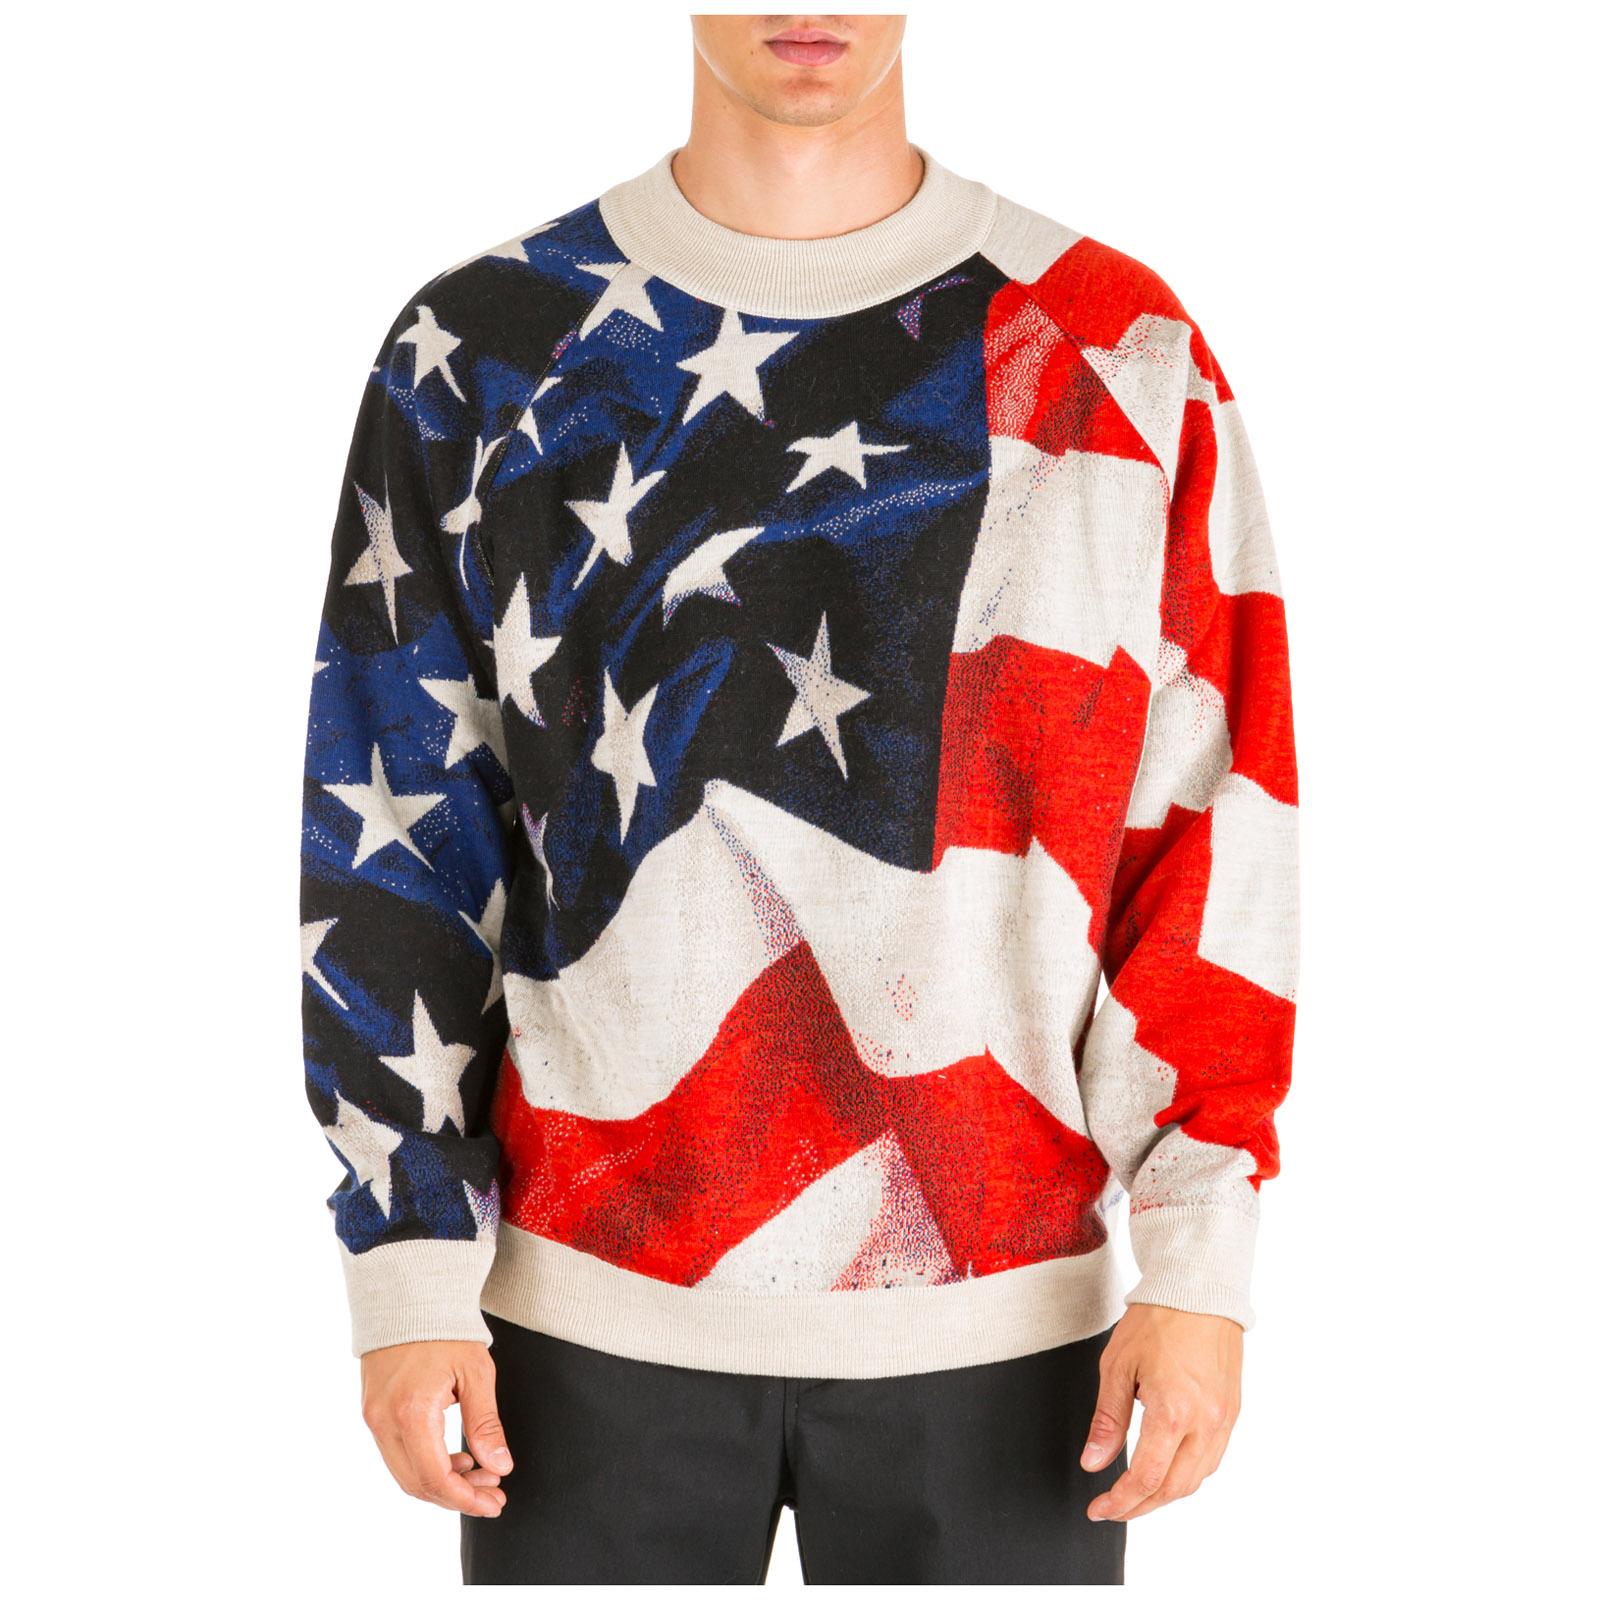 Ih Nom Uh Nit Sweaters MEN'S CREW NECK NECKLINE JUMPER SWEATER PULLOVER AMERICAN FLAG OVERSIZE FIT